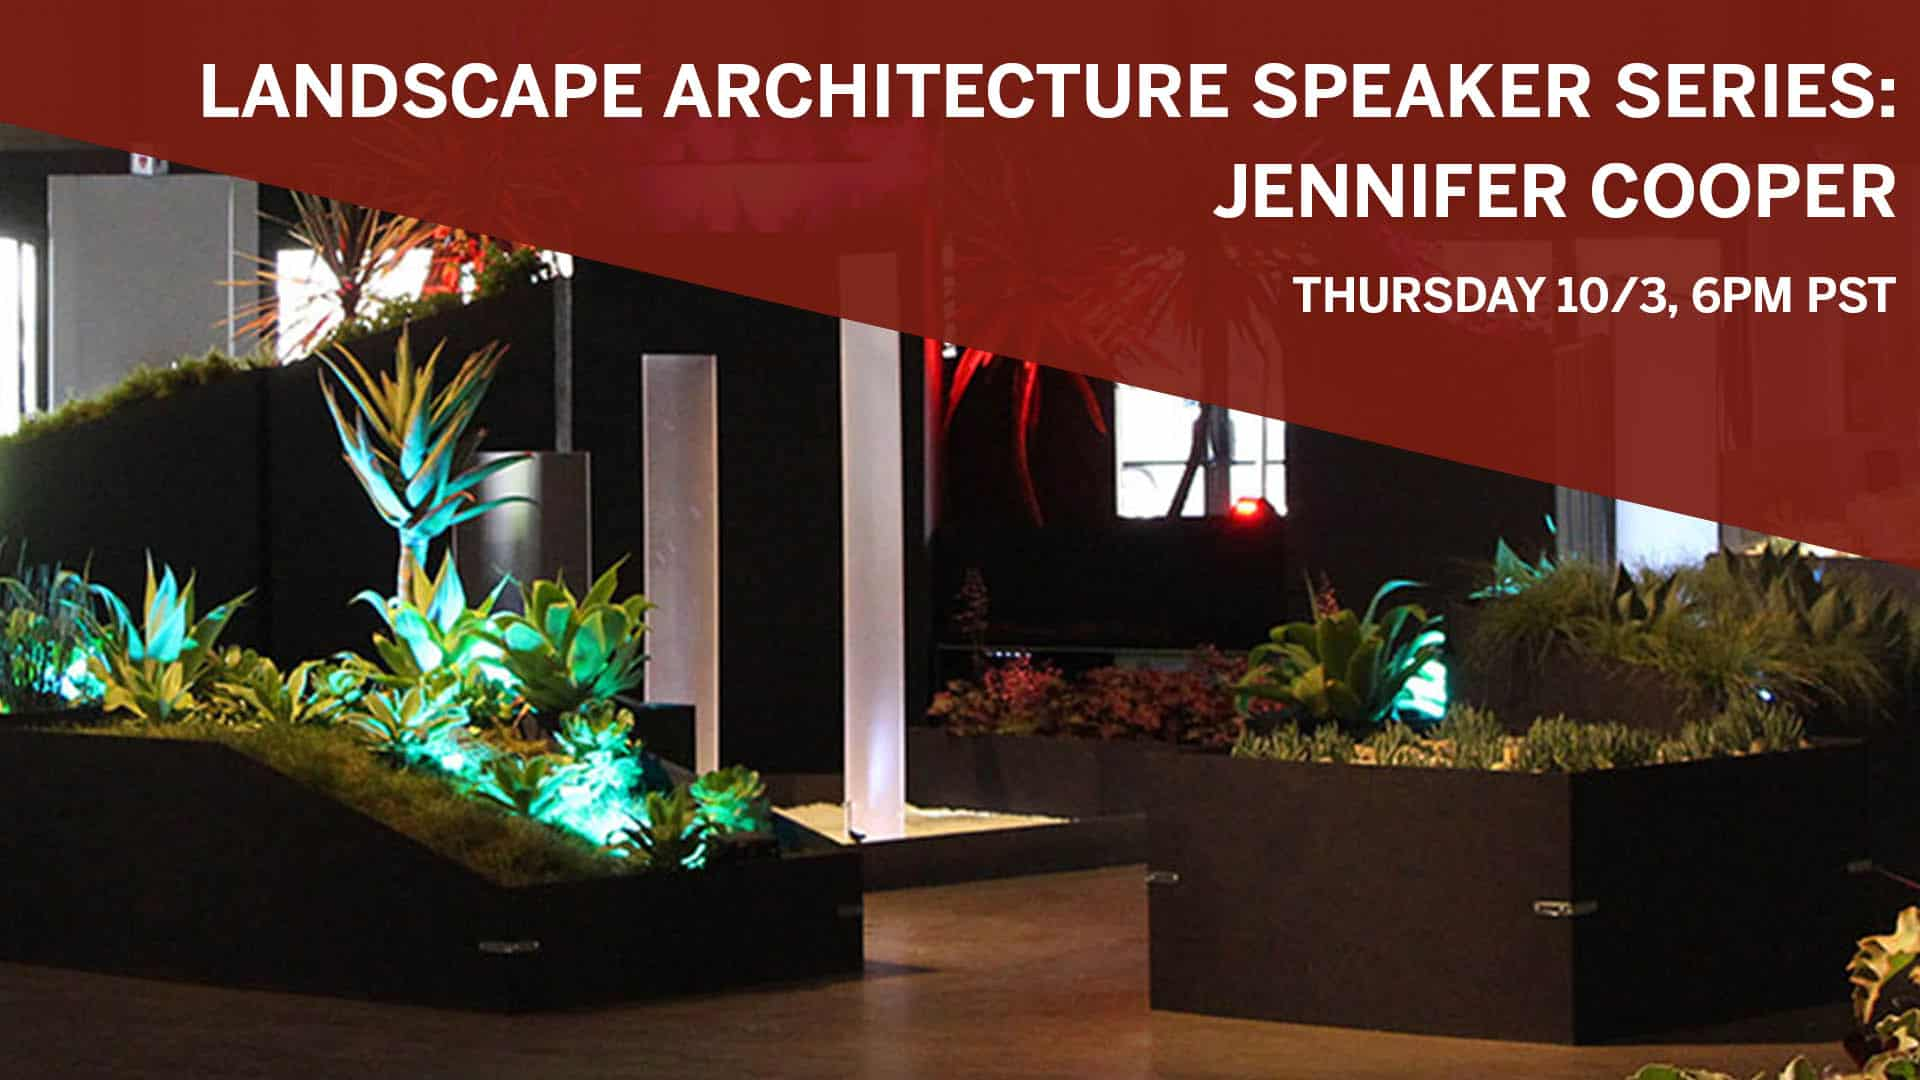 Landscape Architecture Speaker Series: Jennifer Cooper